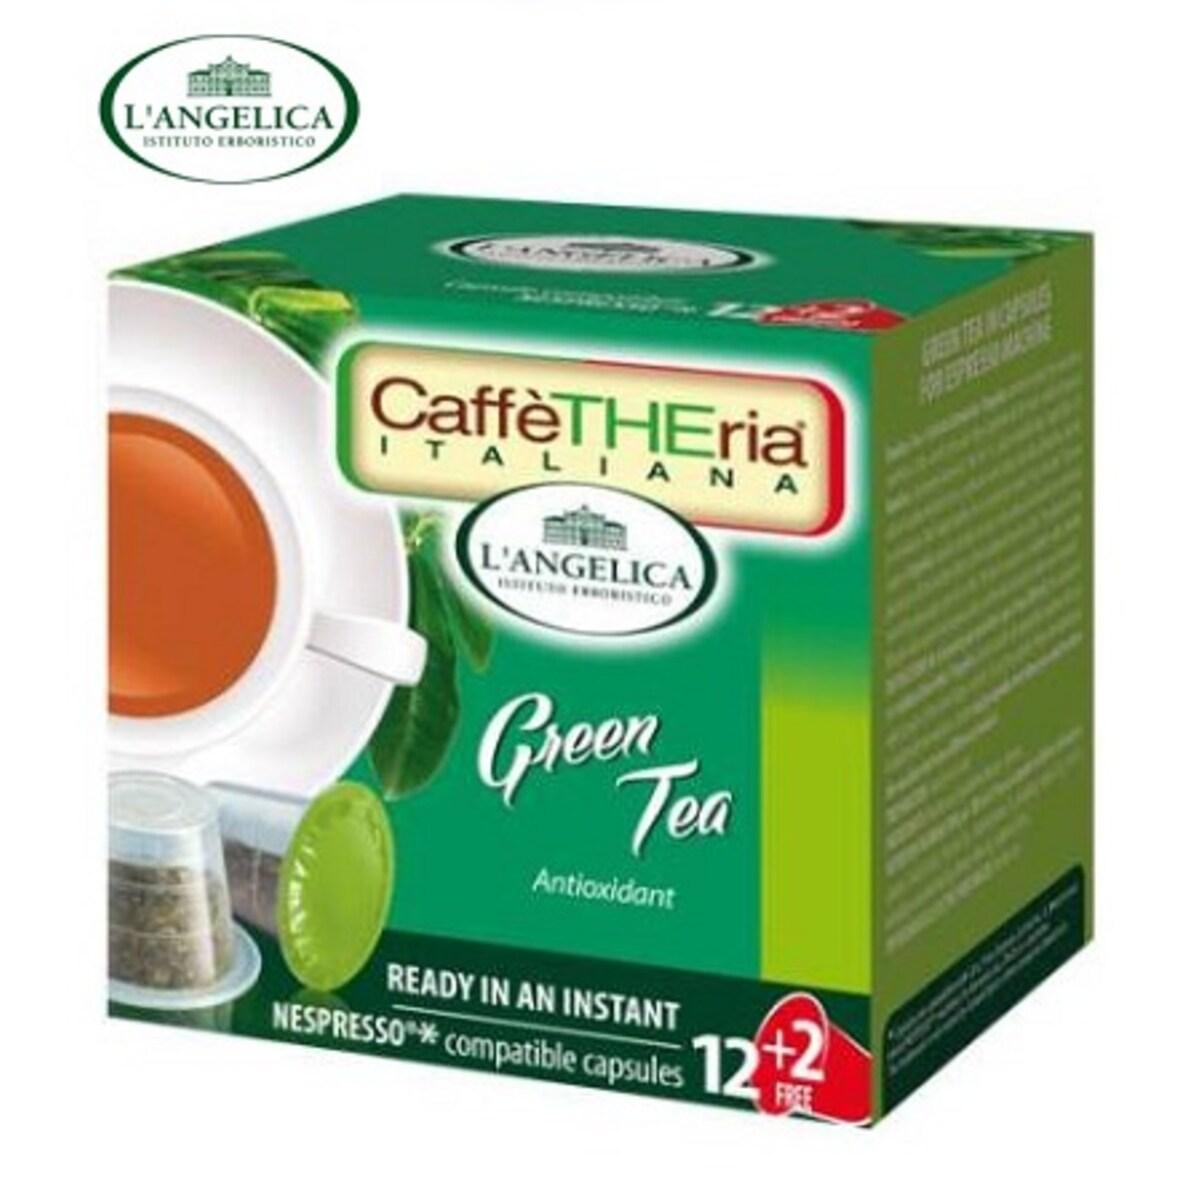 L'angelicа - Зелен чай, капсули за Nespresso кафе машина